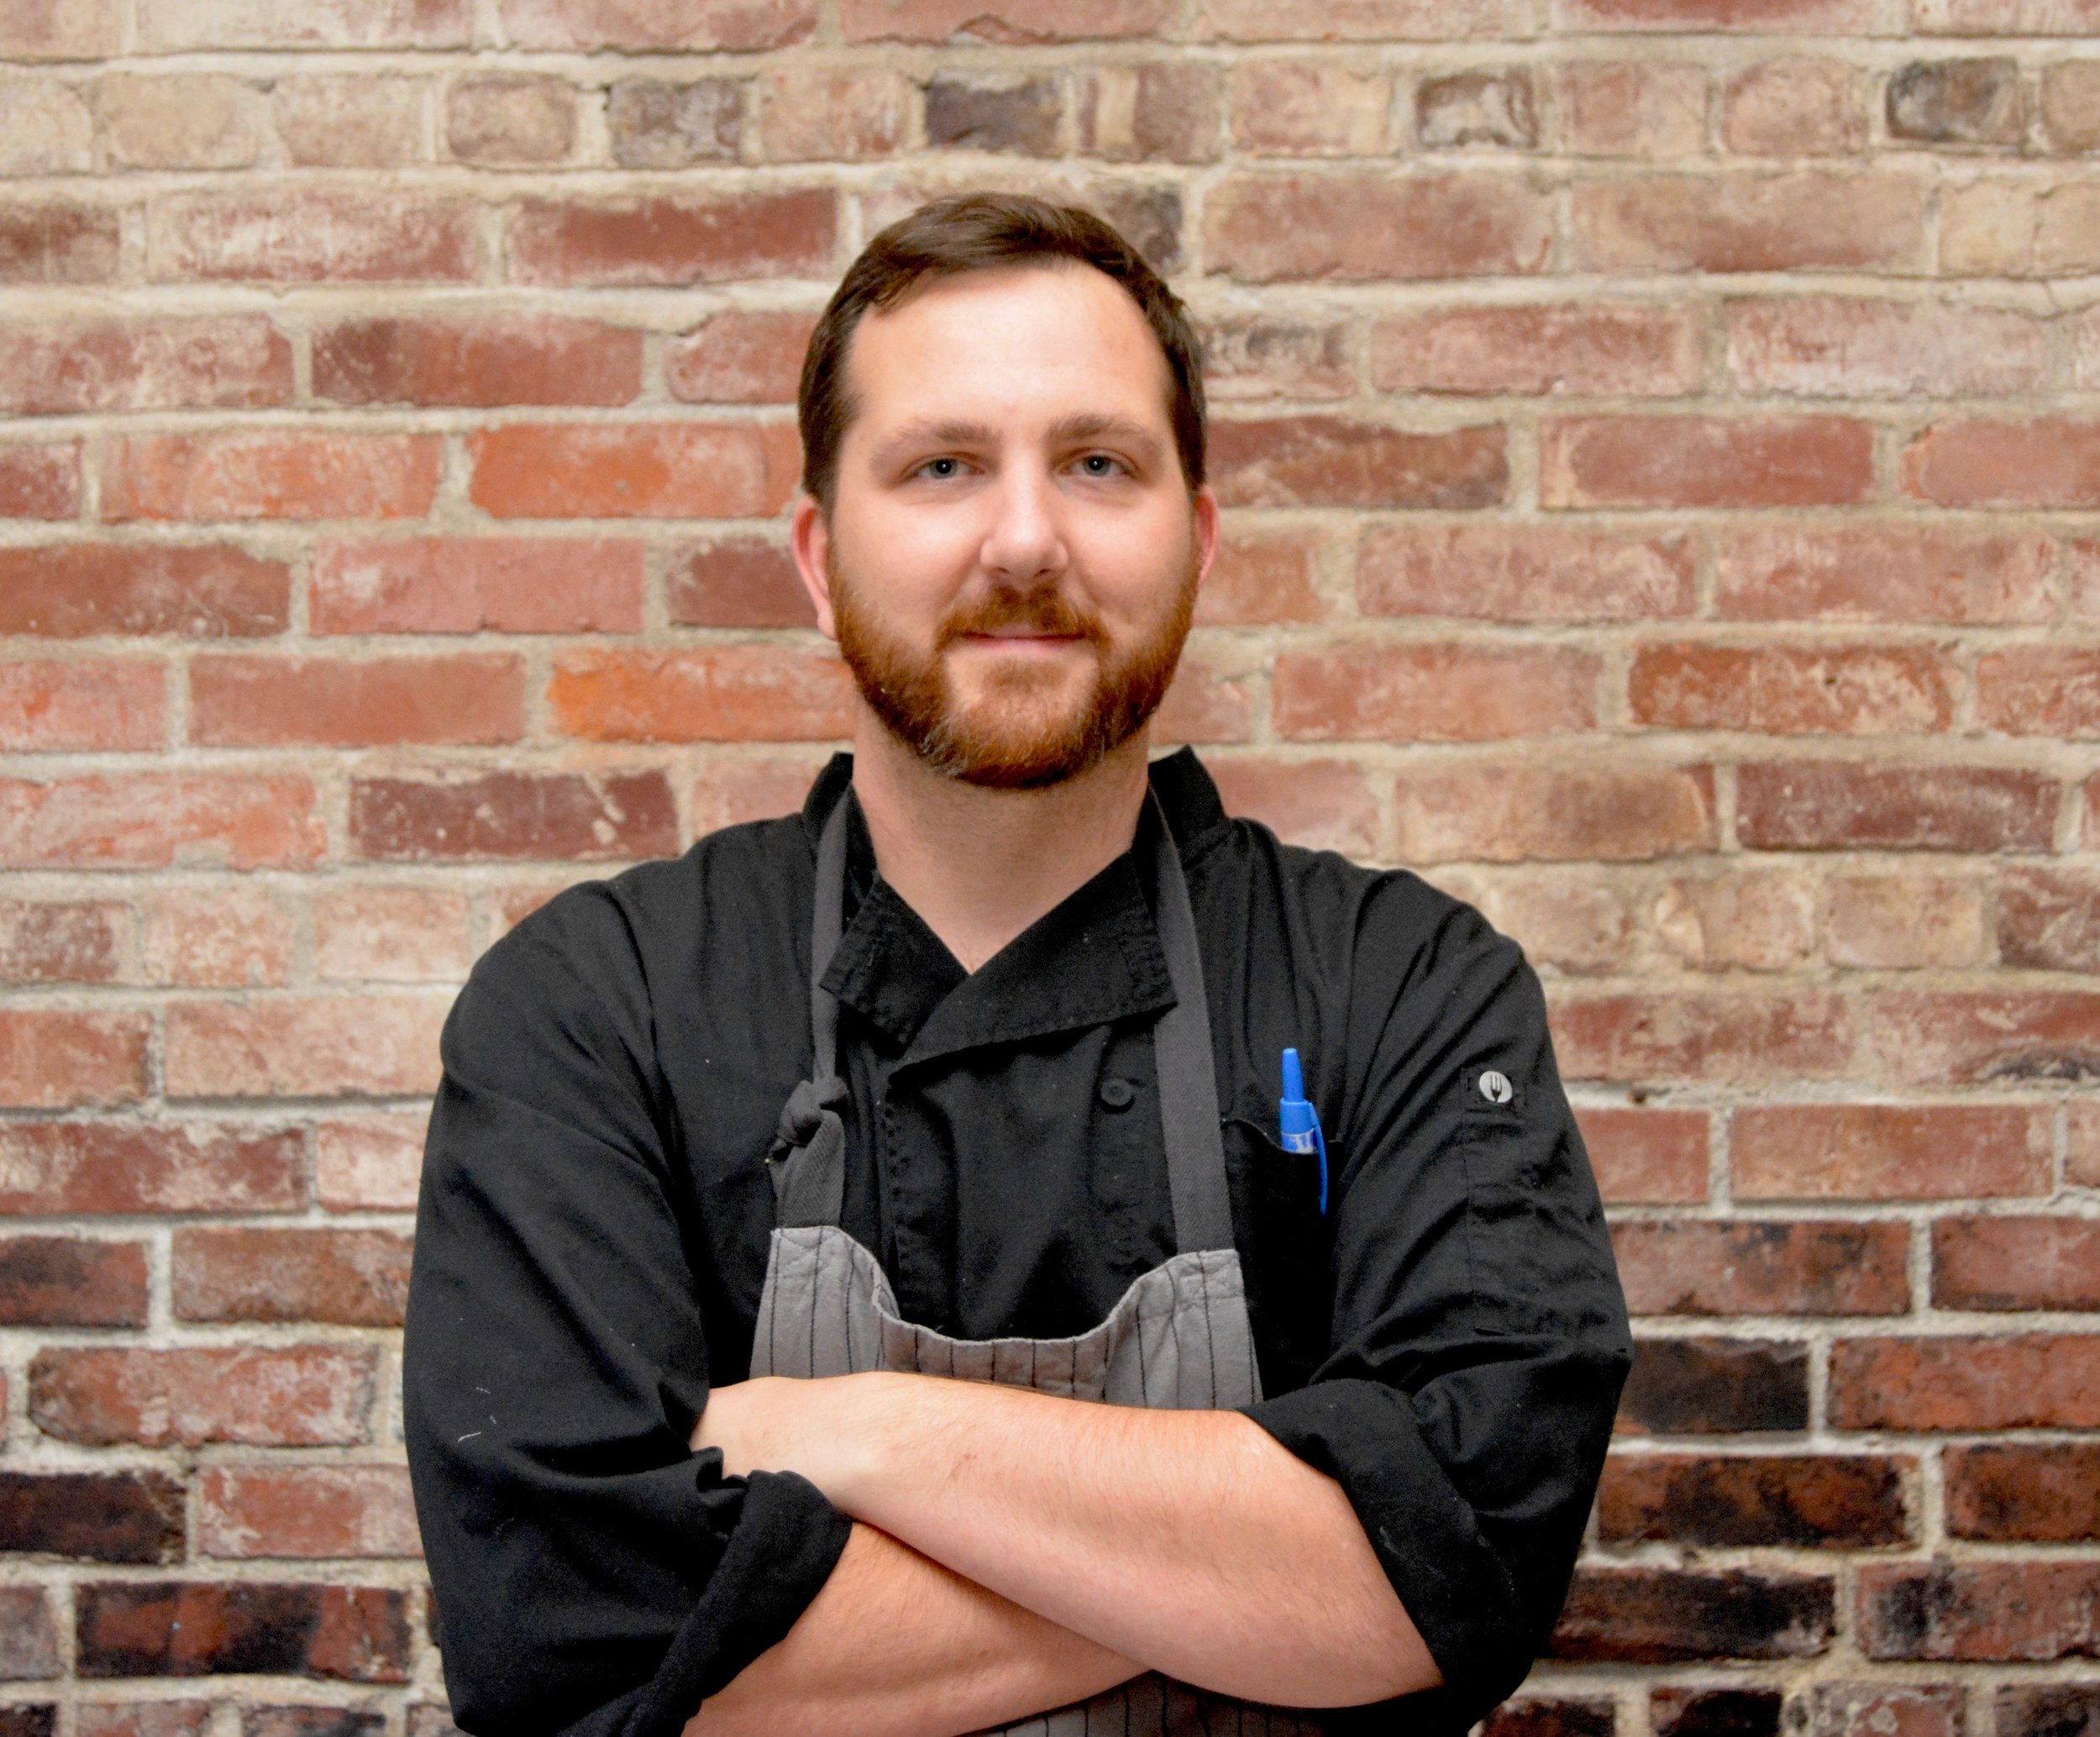 Chef Chad Bergman